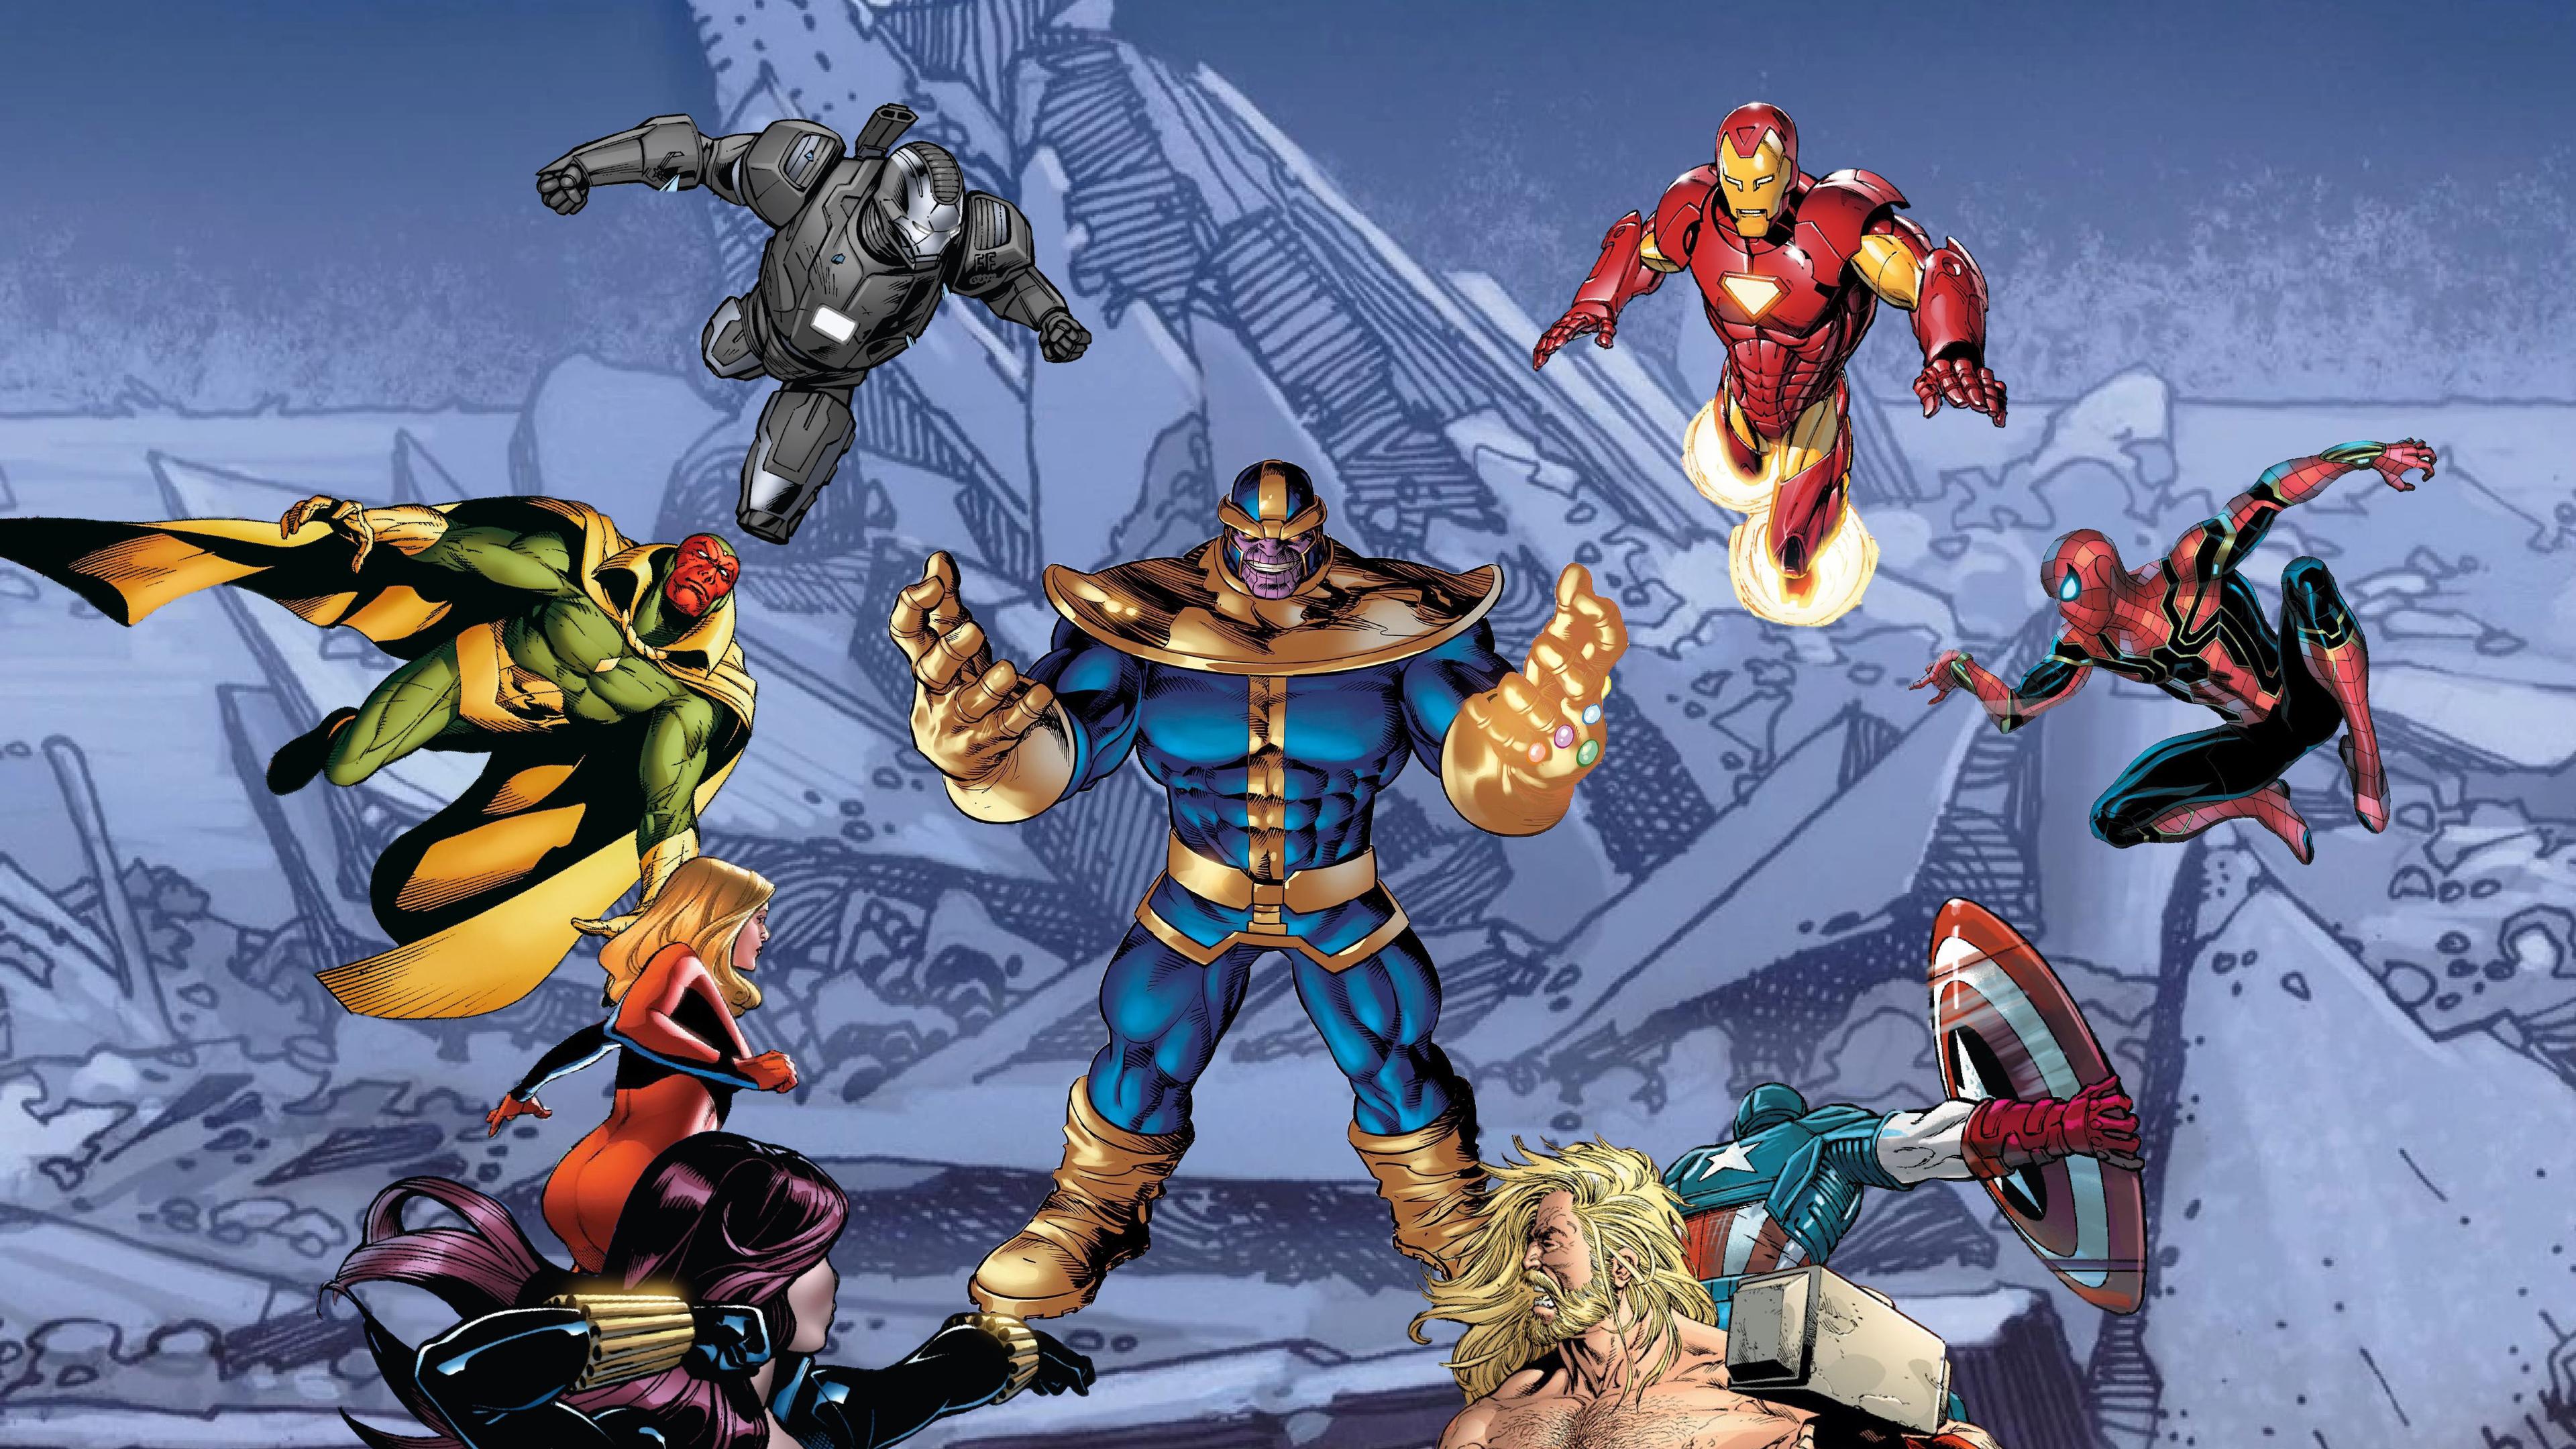 Wallpaper 4k Thanos Vs Superheroes 4k 4k-wallpapers, 5k